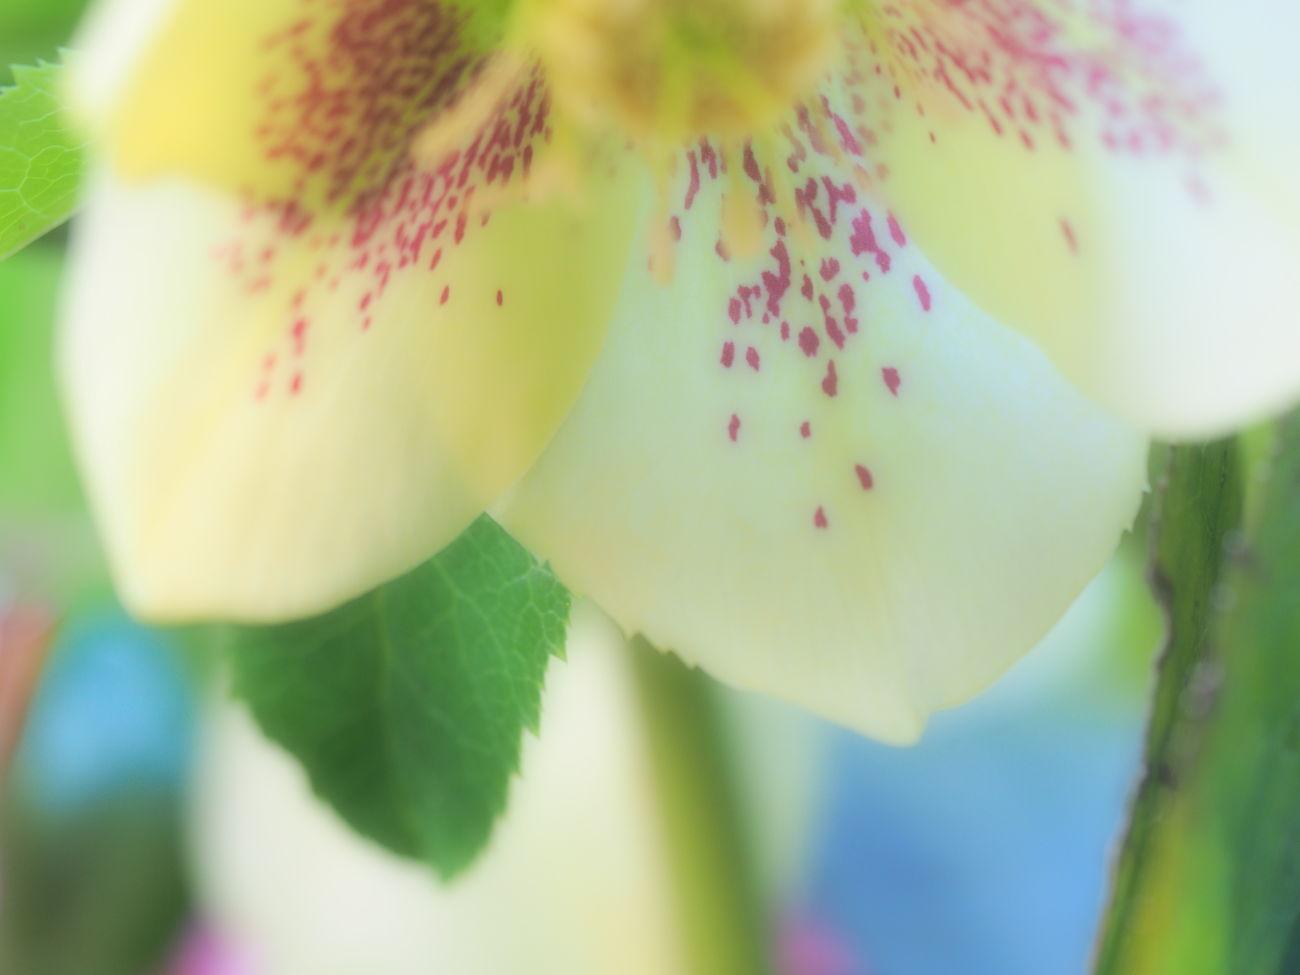 EyeEmFlower Flower Flower Collection Flowers Goodmorning Goodmorning :) Goodmorning EyeEm  Goodmorning ♥ GoodMorning⛅ Hello Hello EyeEm Hello World Hello World ✌ Hello ❤ HelloEyeEm Helloworld